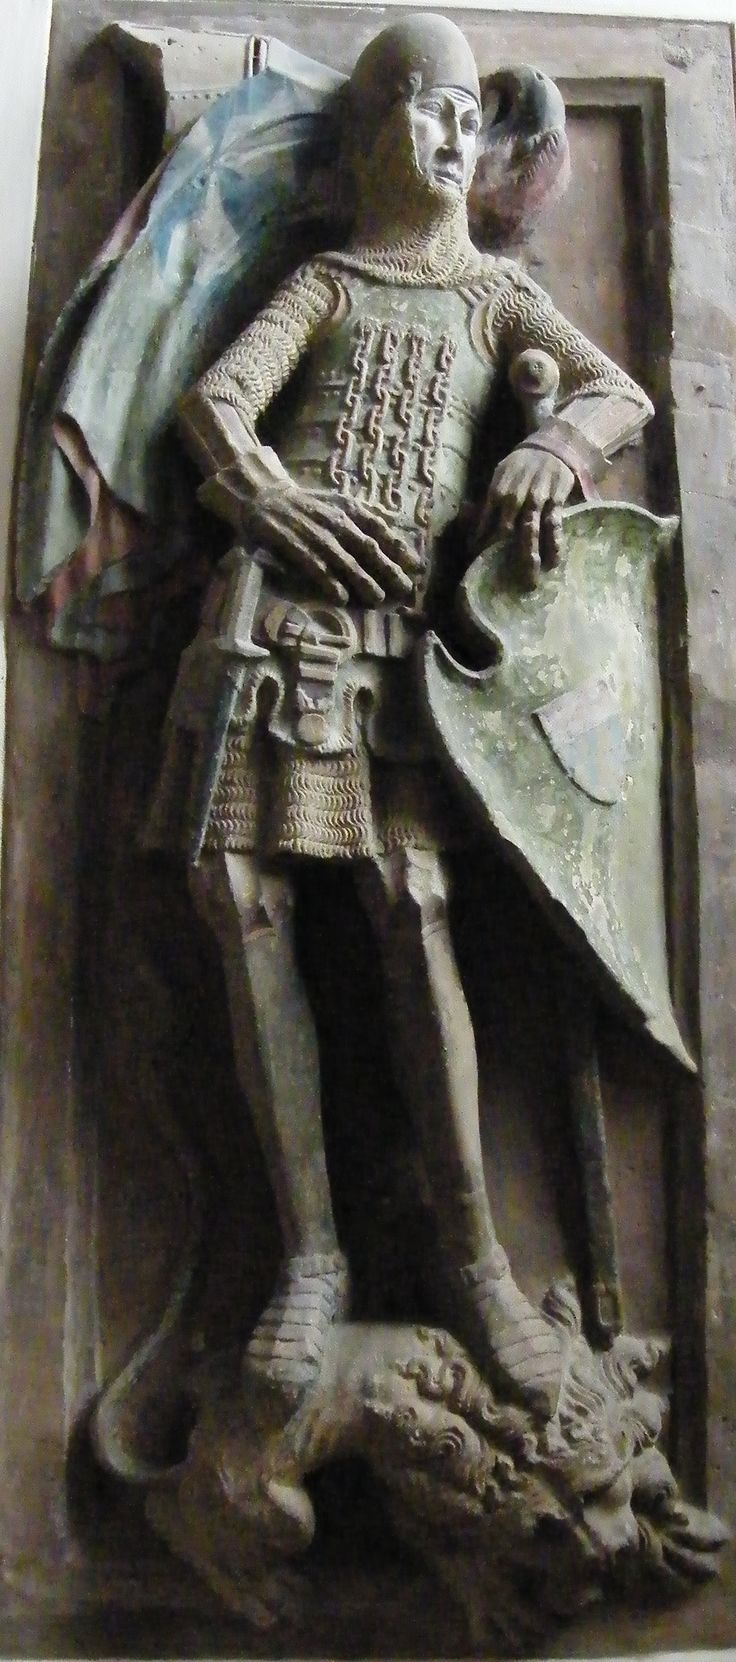 Walther Bopfinger 1336  Germany Bopfingen - St Blasius  Note similarity to the extant coat of plates from Hirschenstein castle.